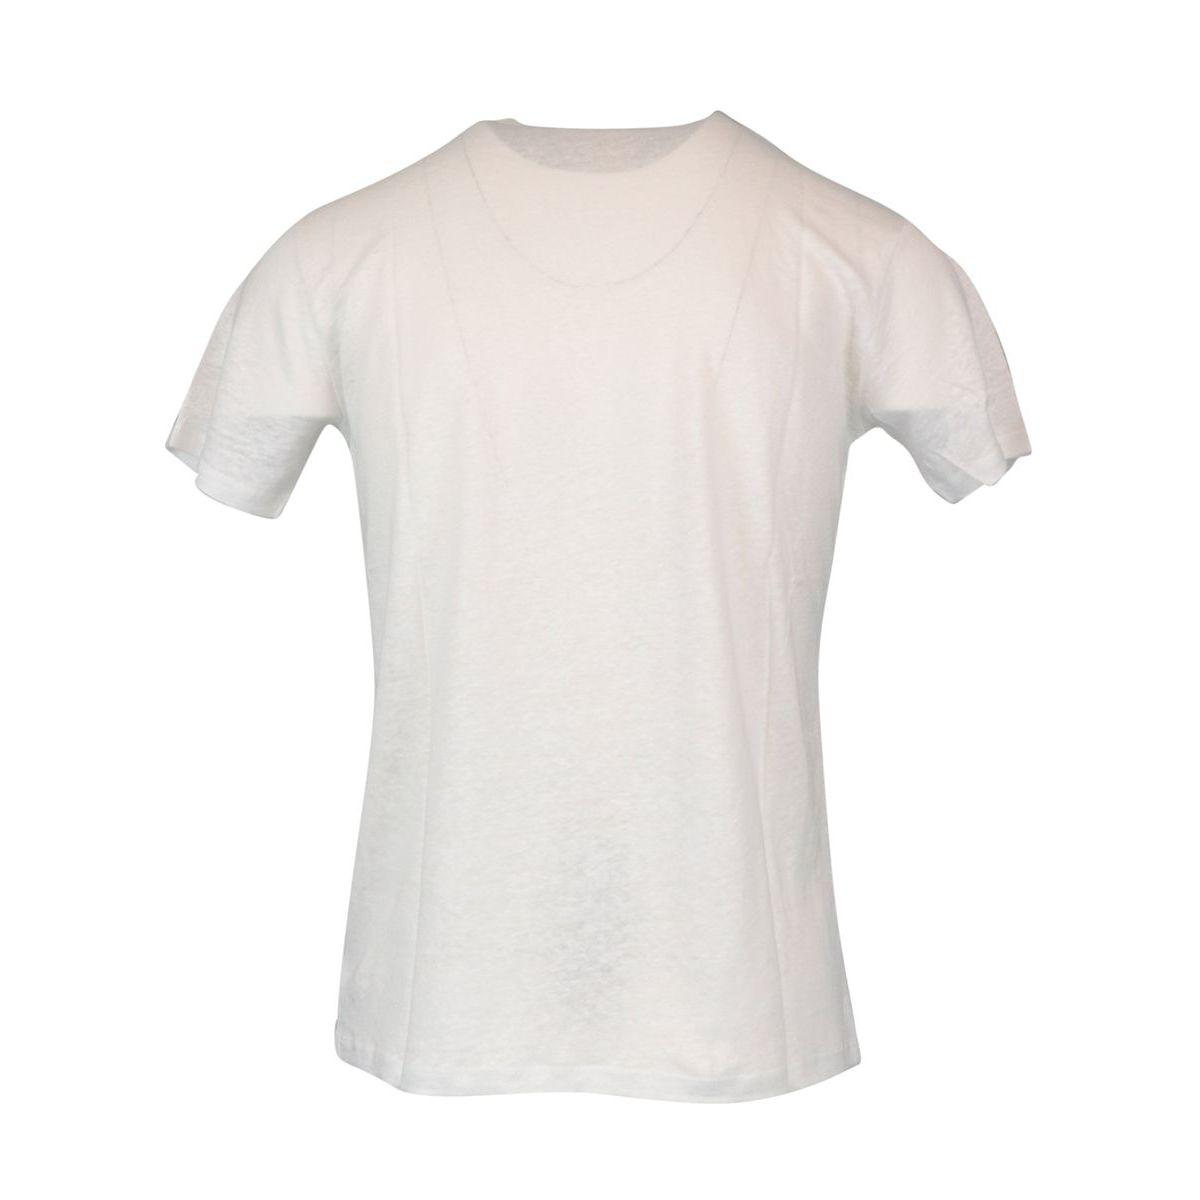 Linen T-shirt Pay 01 Cream MC2 Saint Barth